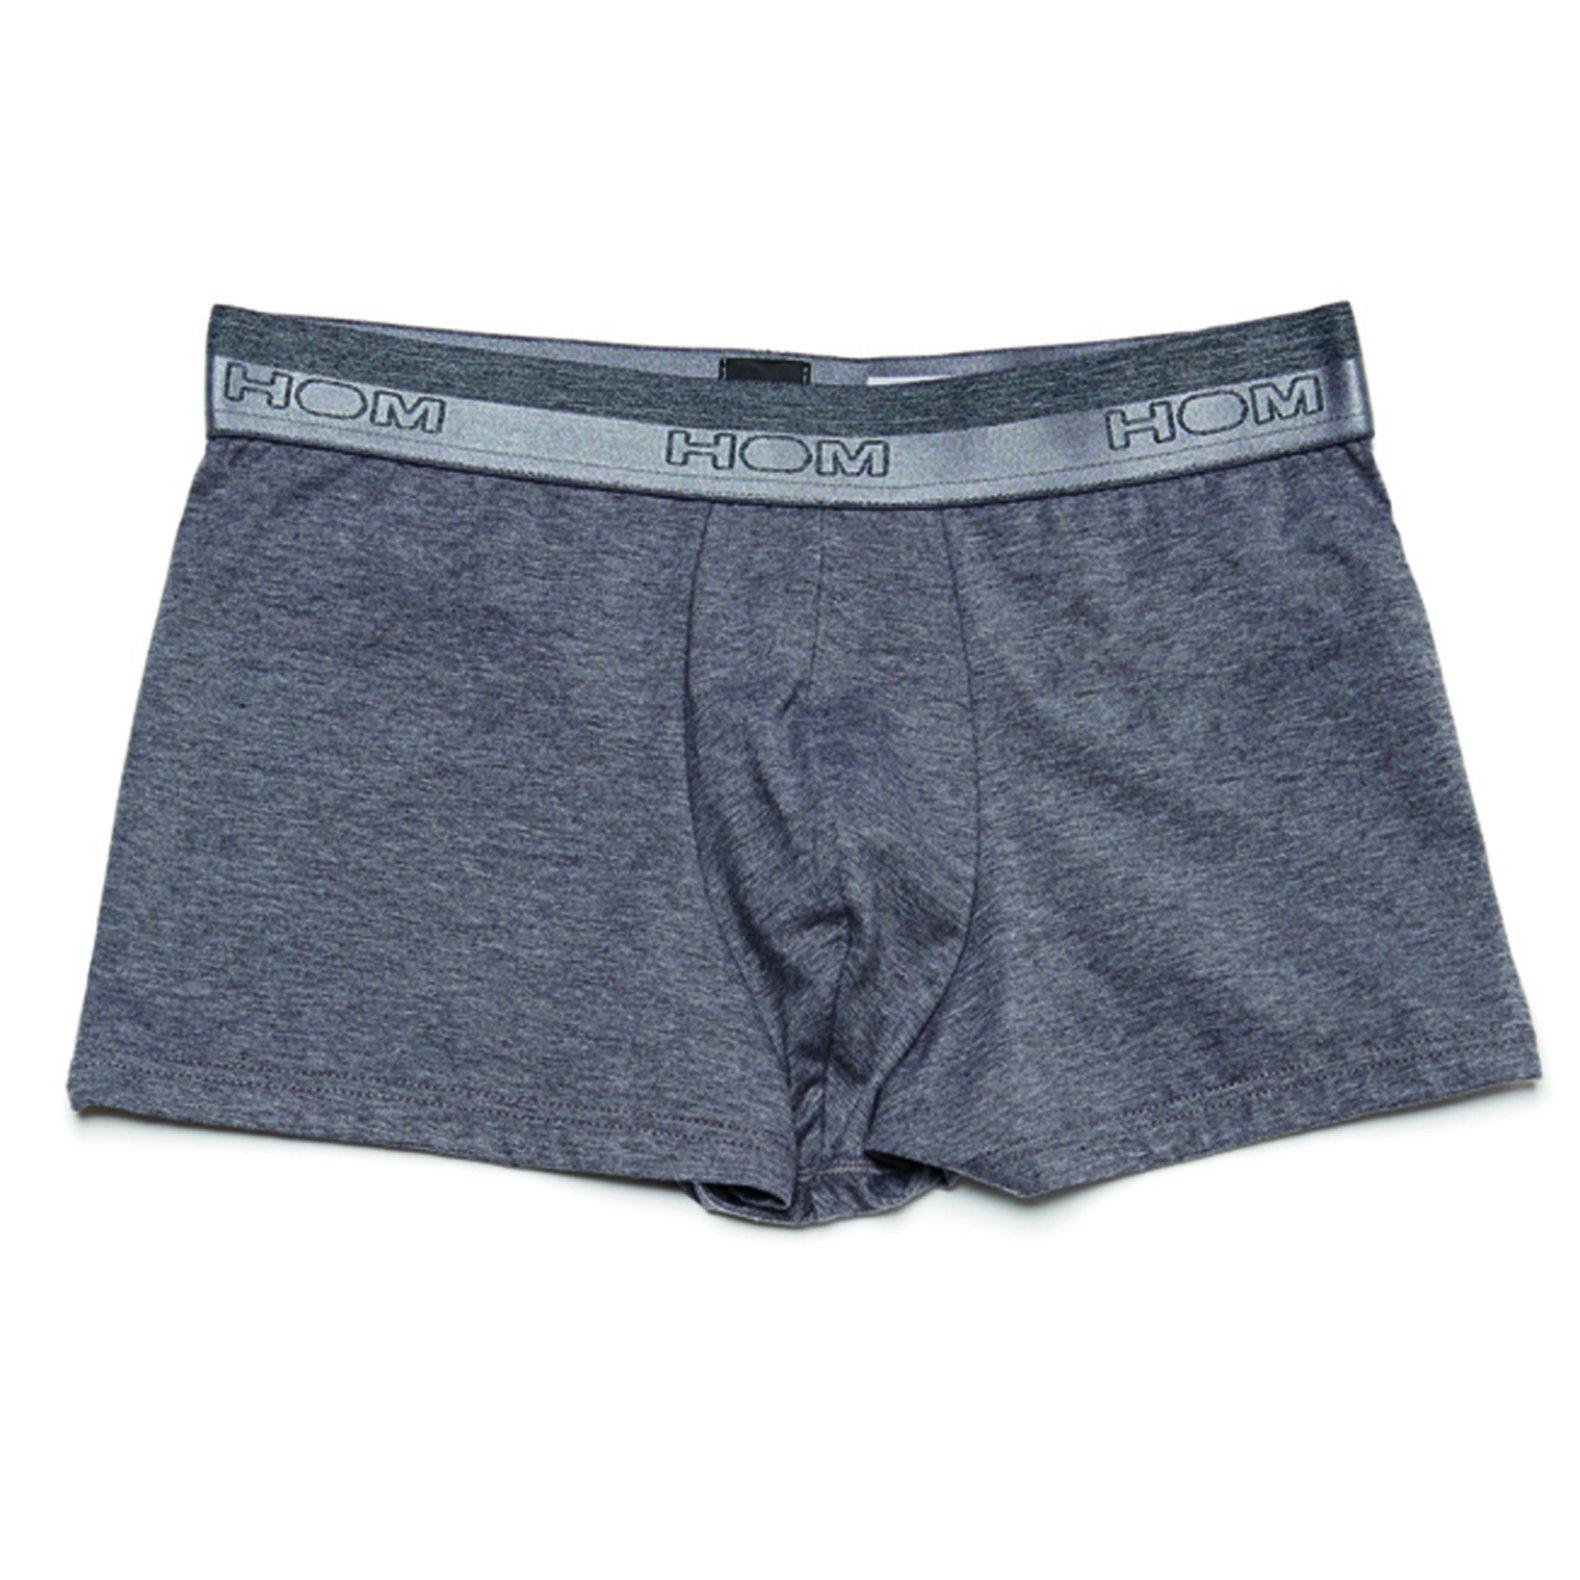 Classic Boxer Briefs Mens Underwear By Hom Usa